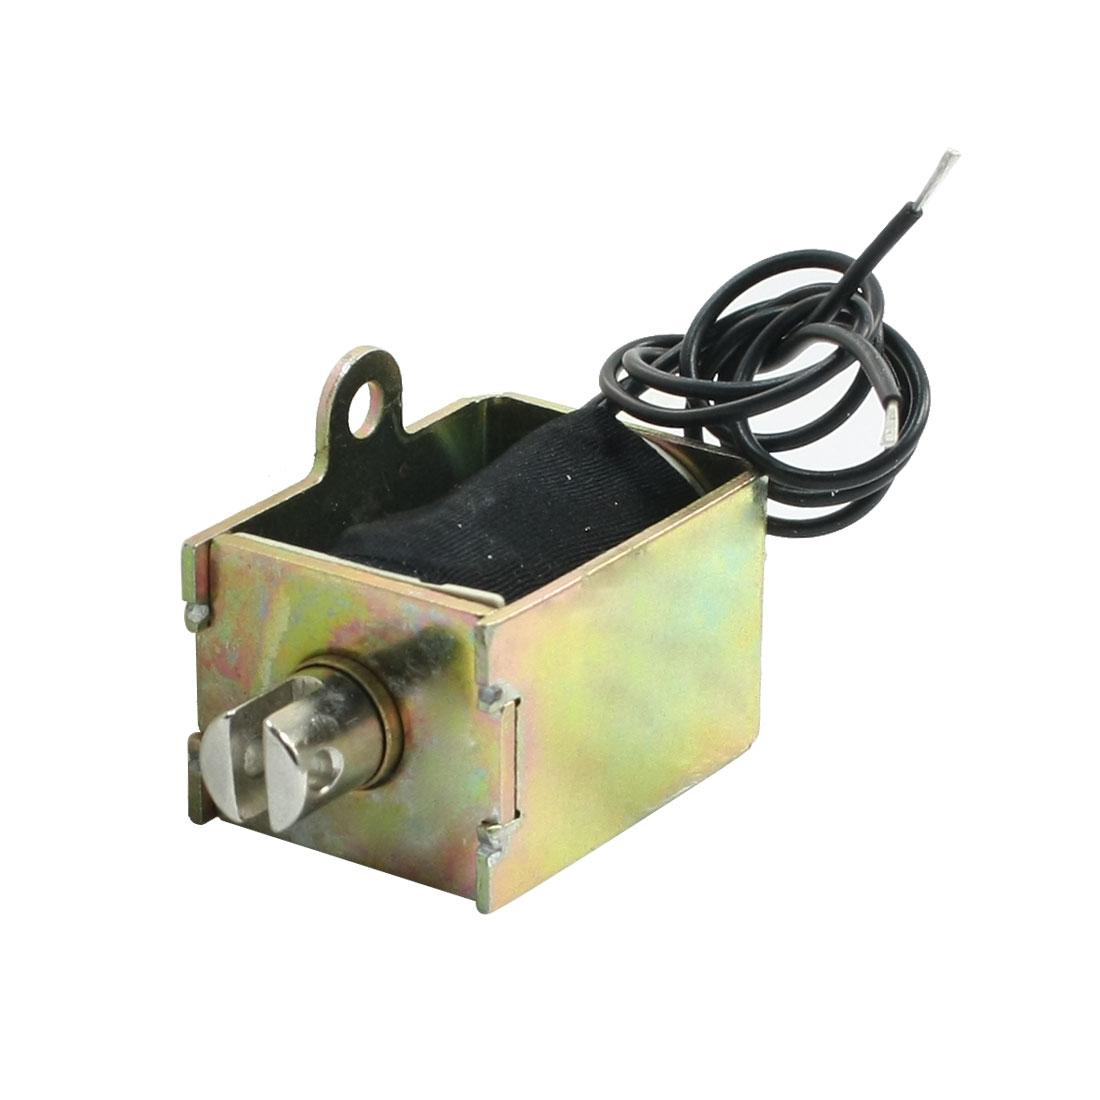 Pull Type AC 220V 121W 6mm Stroke 4.8Kg Force Solenoid Electromagnet